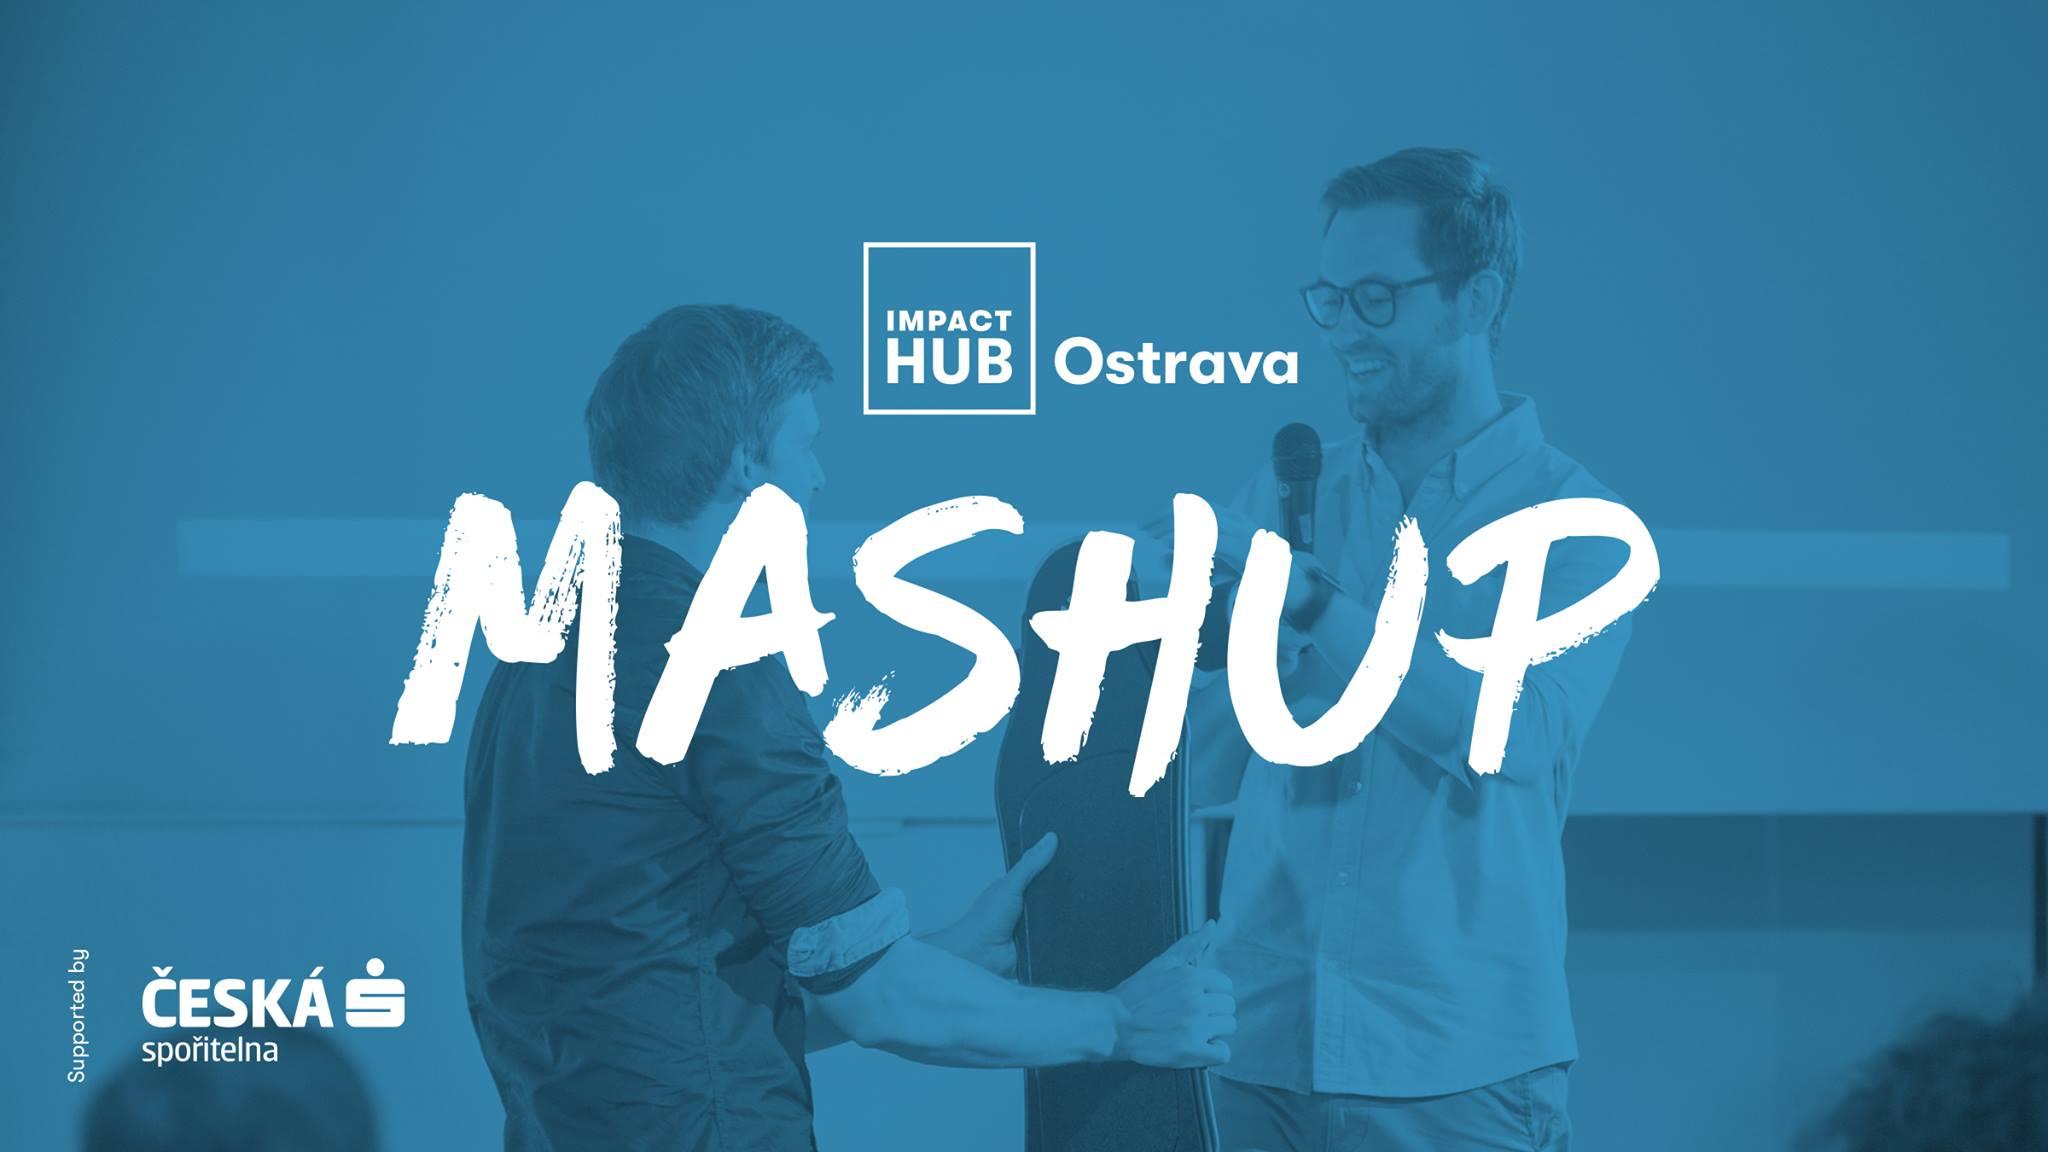 Impact Hub MashUp Ostrava 2019